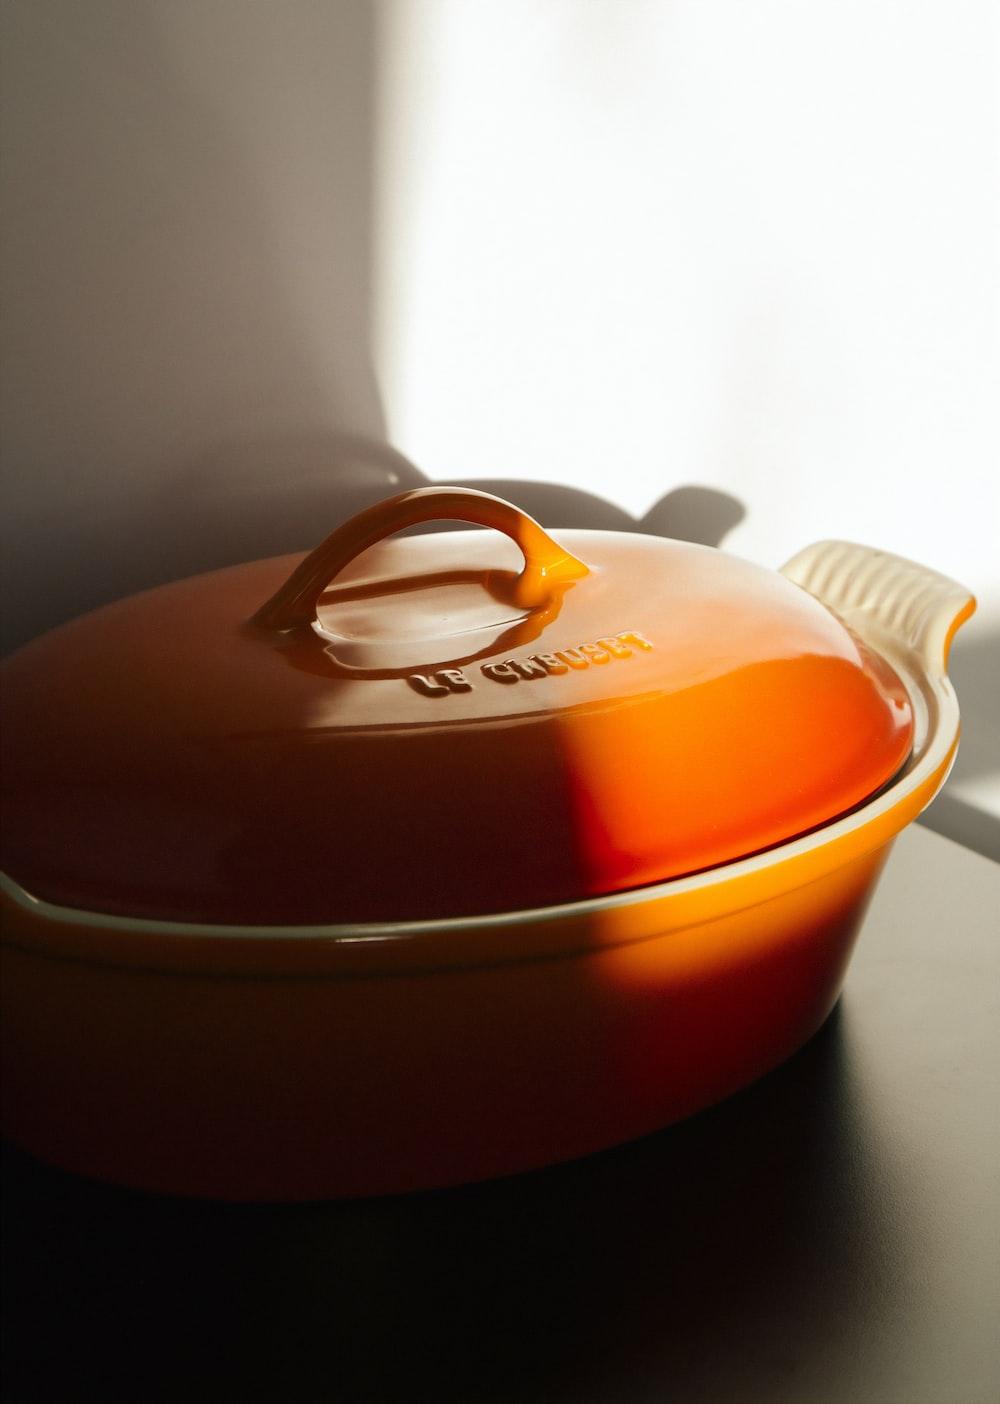 orange casserole dish